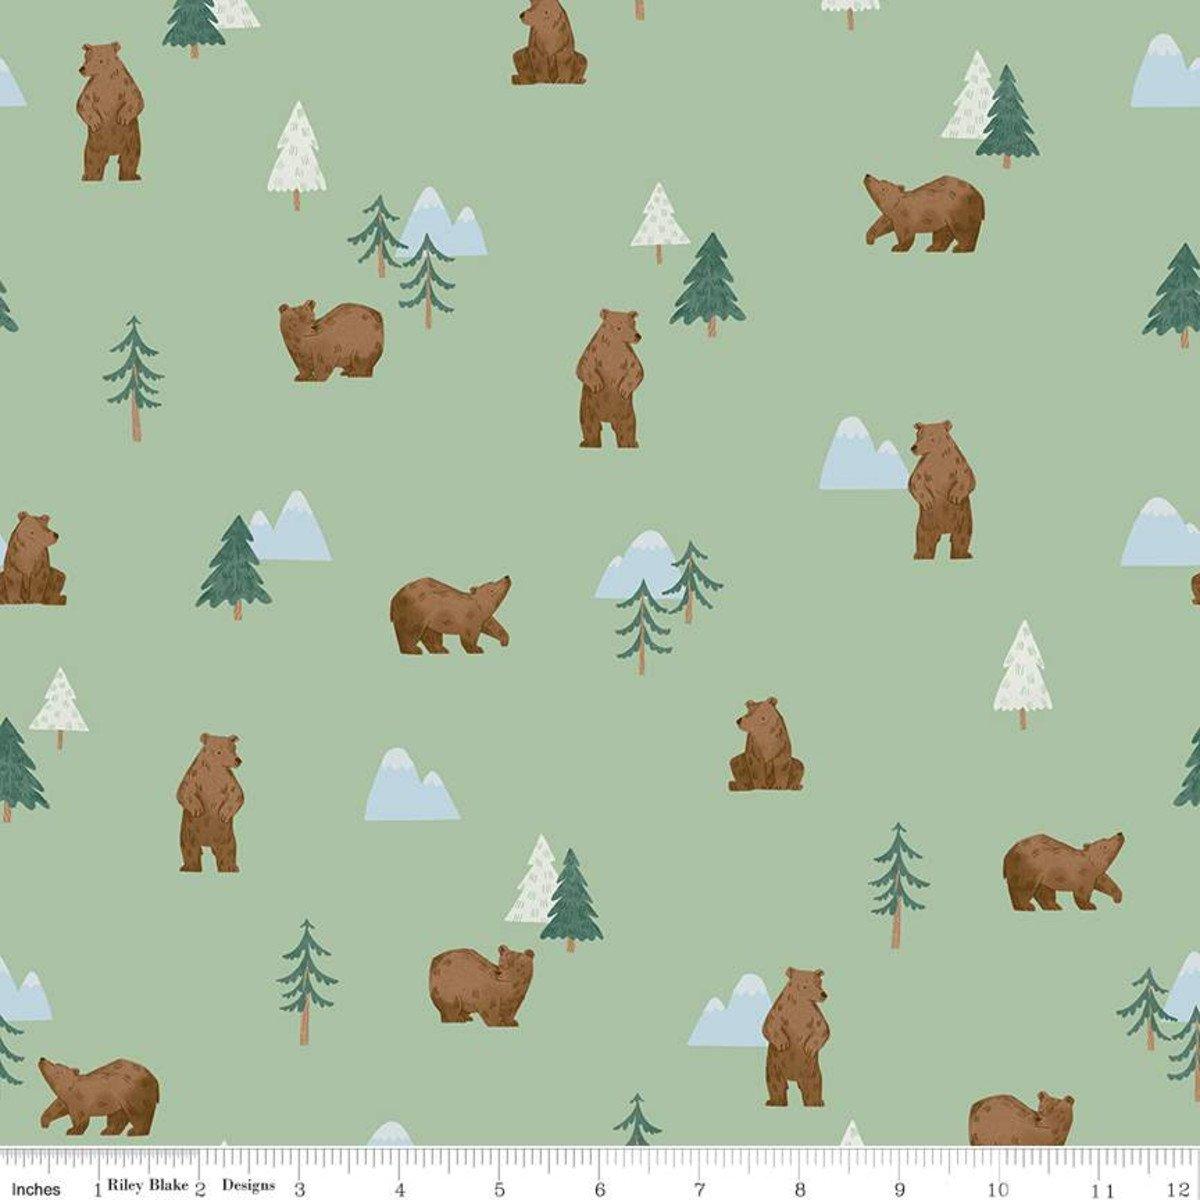 Camp Woodland Grizzly Bears Pistachio   - C10461-PISTACHIO by Natàlia Juan Abelló for Riley Blake Designs